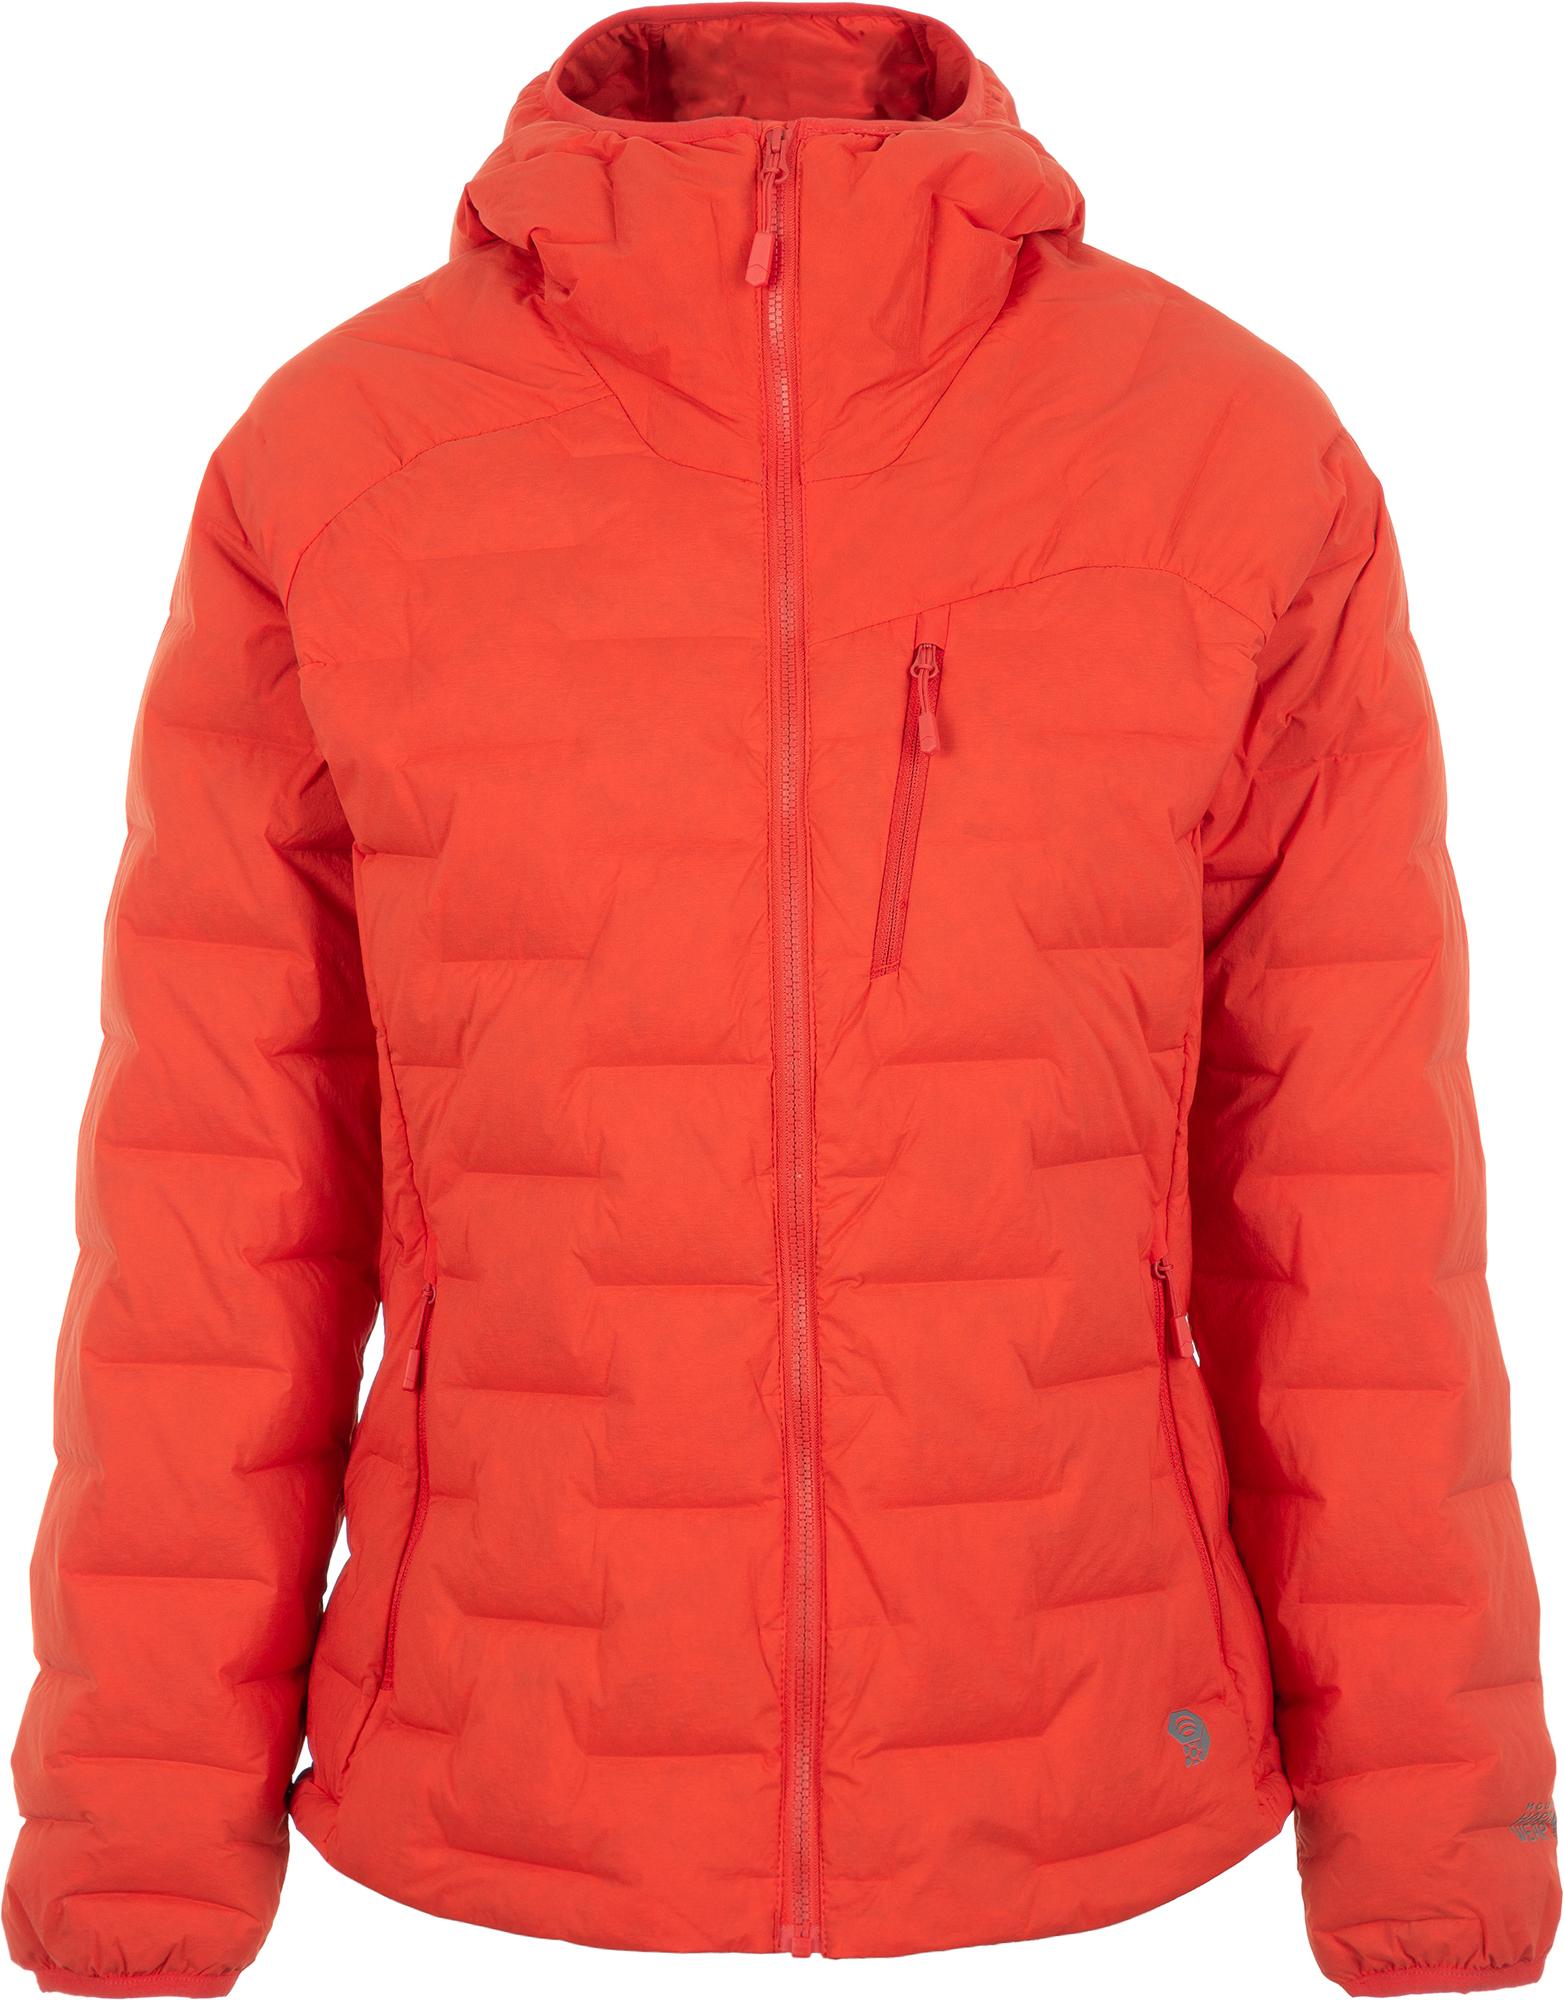 цена Mountain Hardwear Куртка пуховая женская Mountain Hardwear Super/DS™, размер 50 онлайн в 2017 году